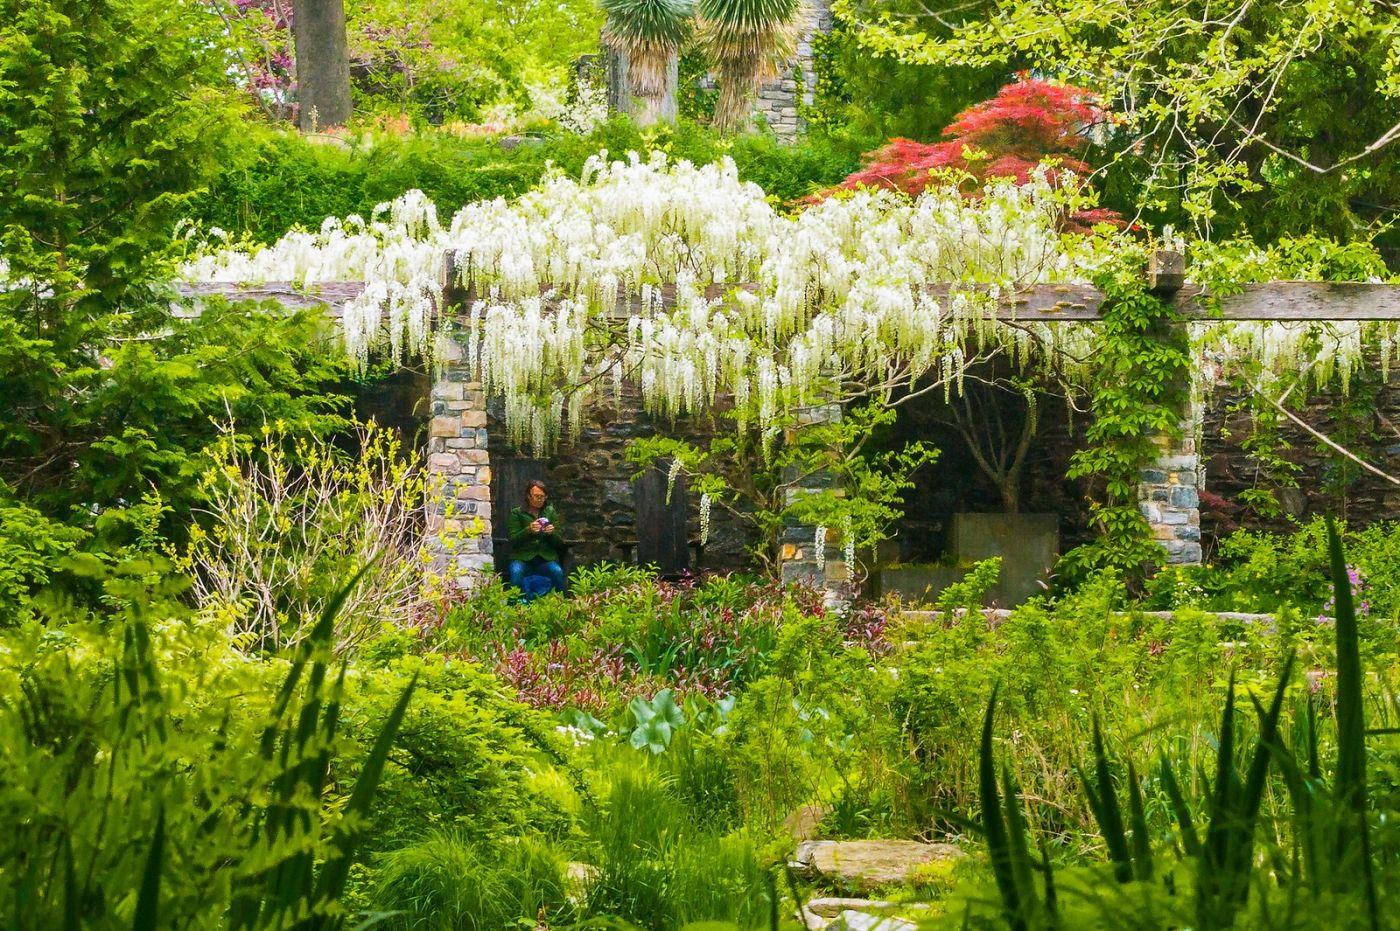 Chanticleer花园,那年盛开的紫藤花_图1-7